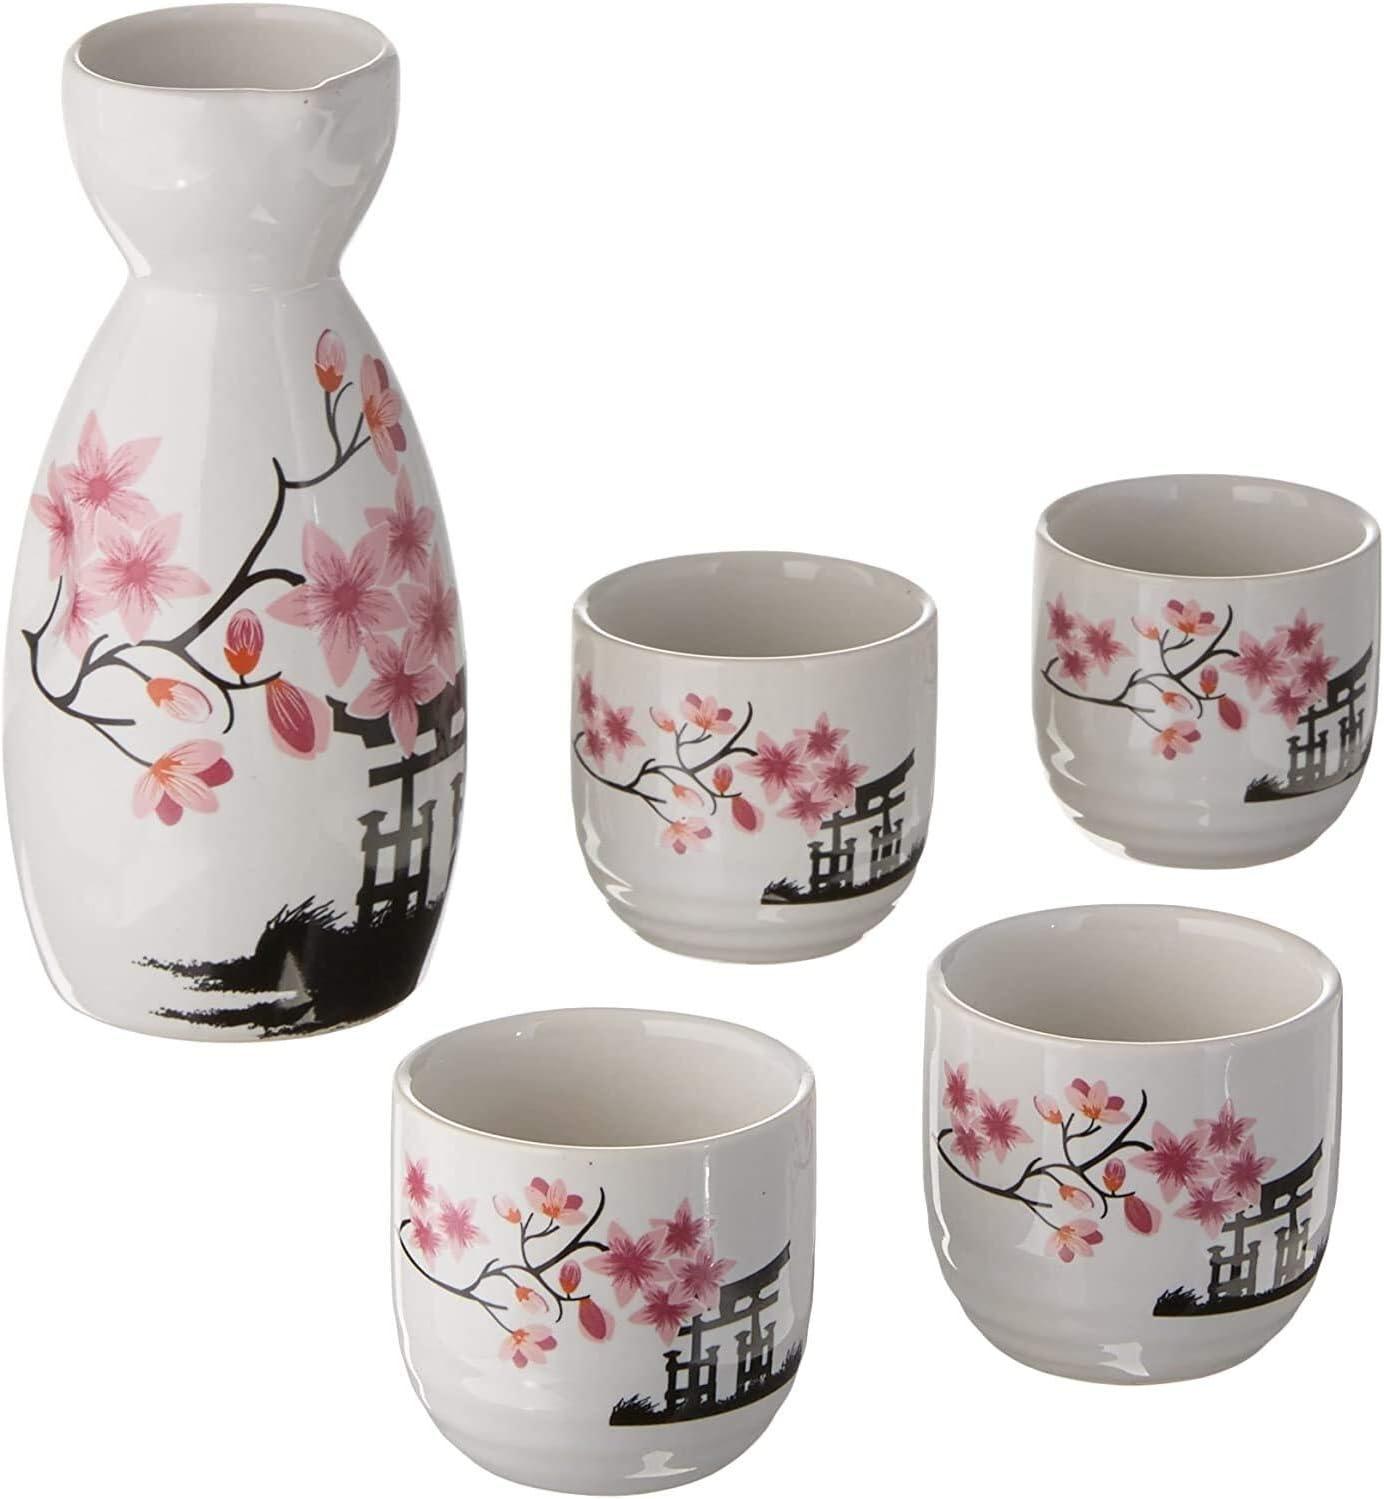 RENFEIYUAN Set de Sake japonés Rosa genérico, Porcelana, Blanco Jarra de Cerveza